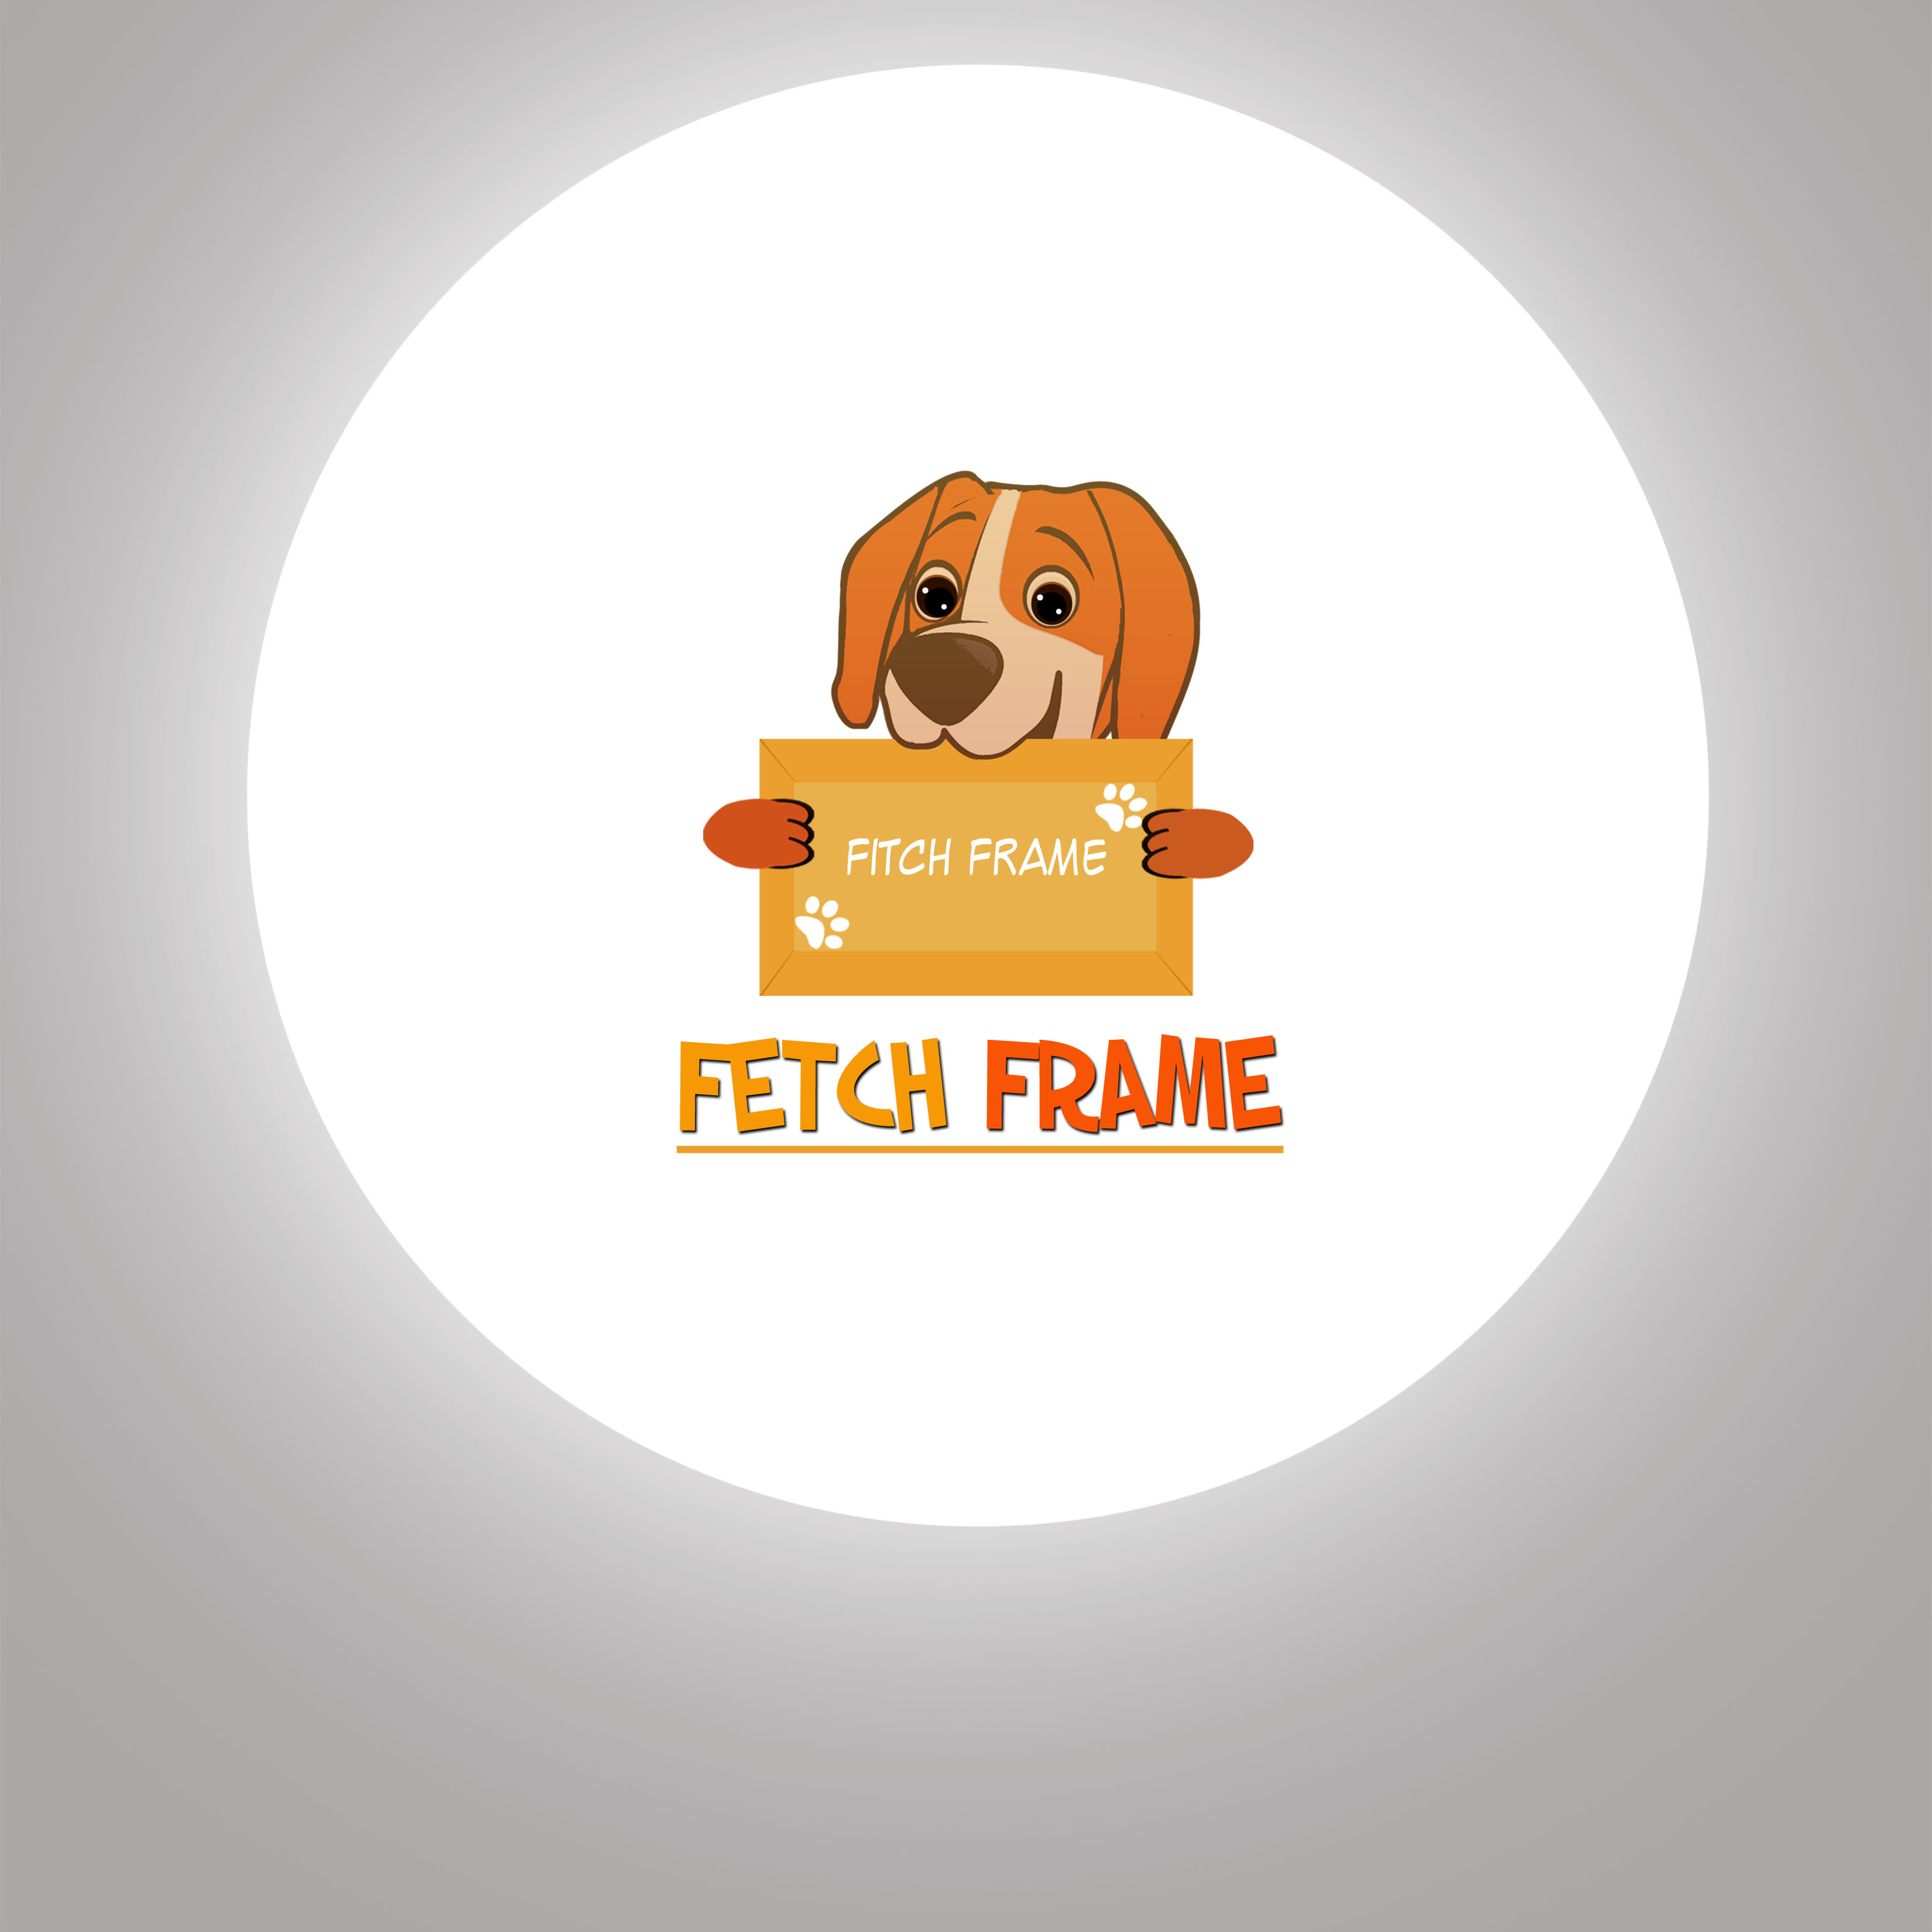 Logo Design by Allan Esclamado - Entry No. 11 in the Logo Design Contest New Logo Design for FetchFrame.